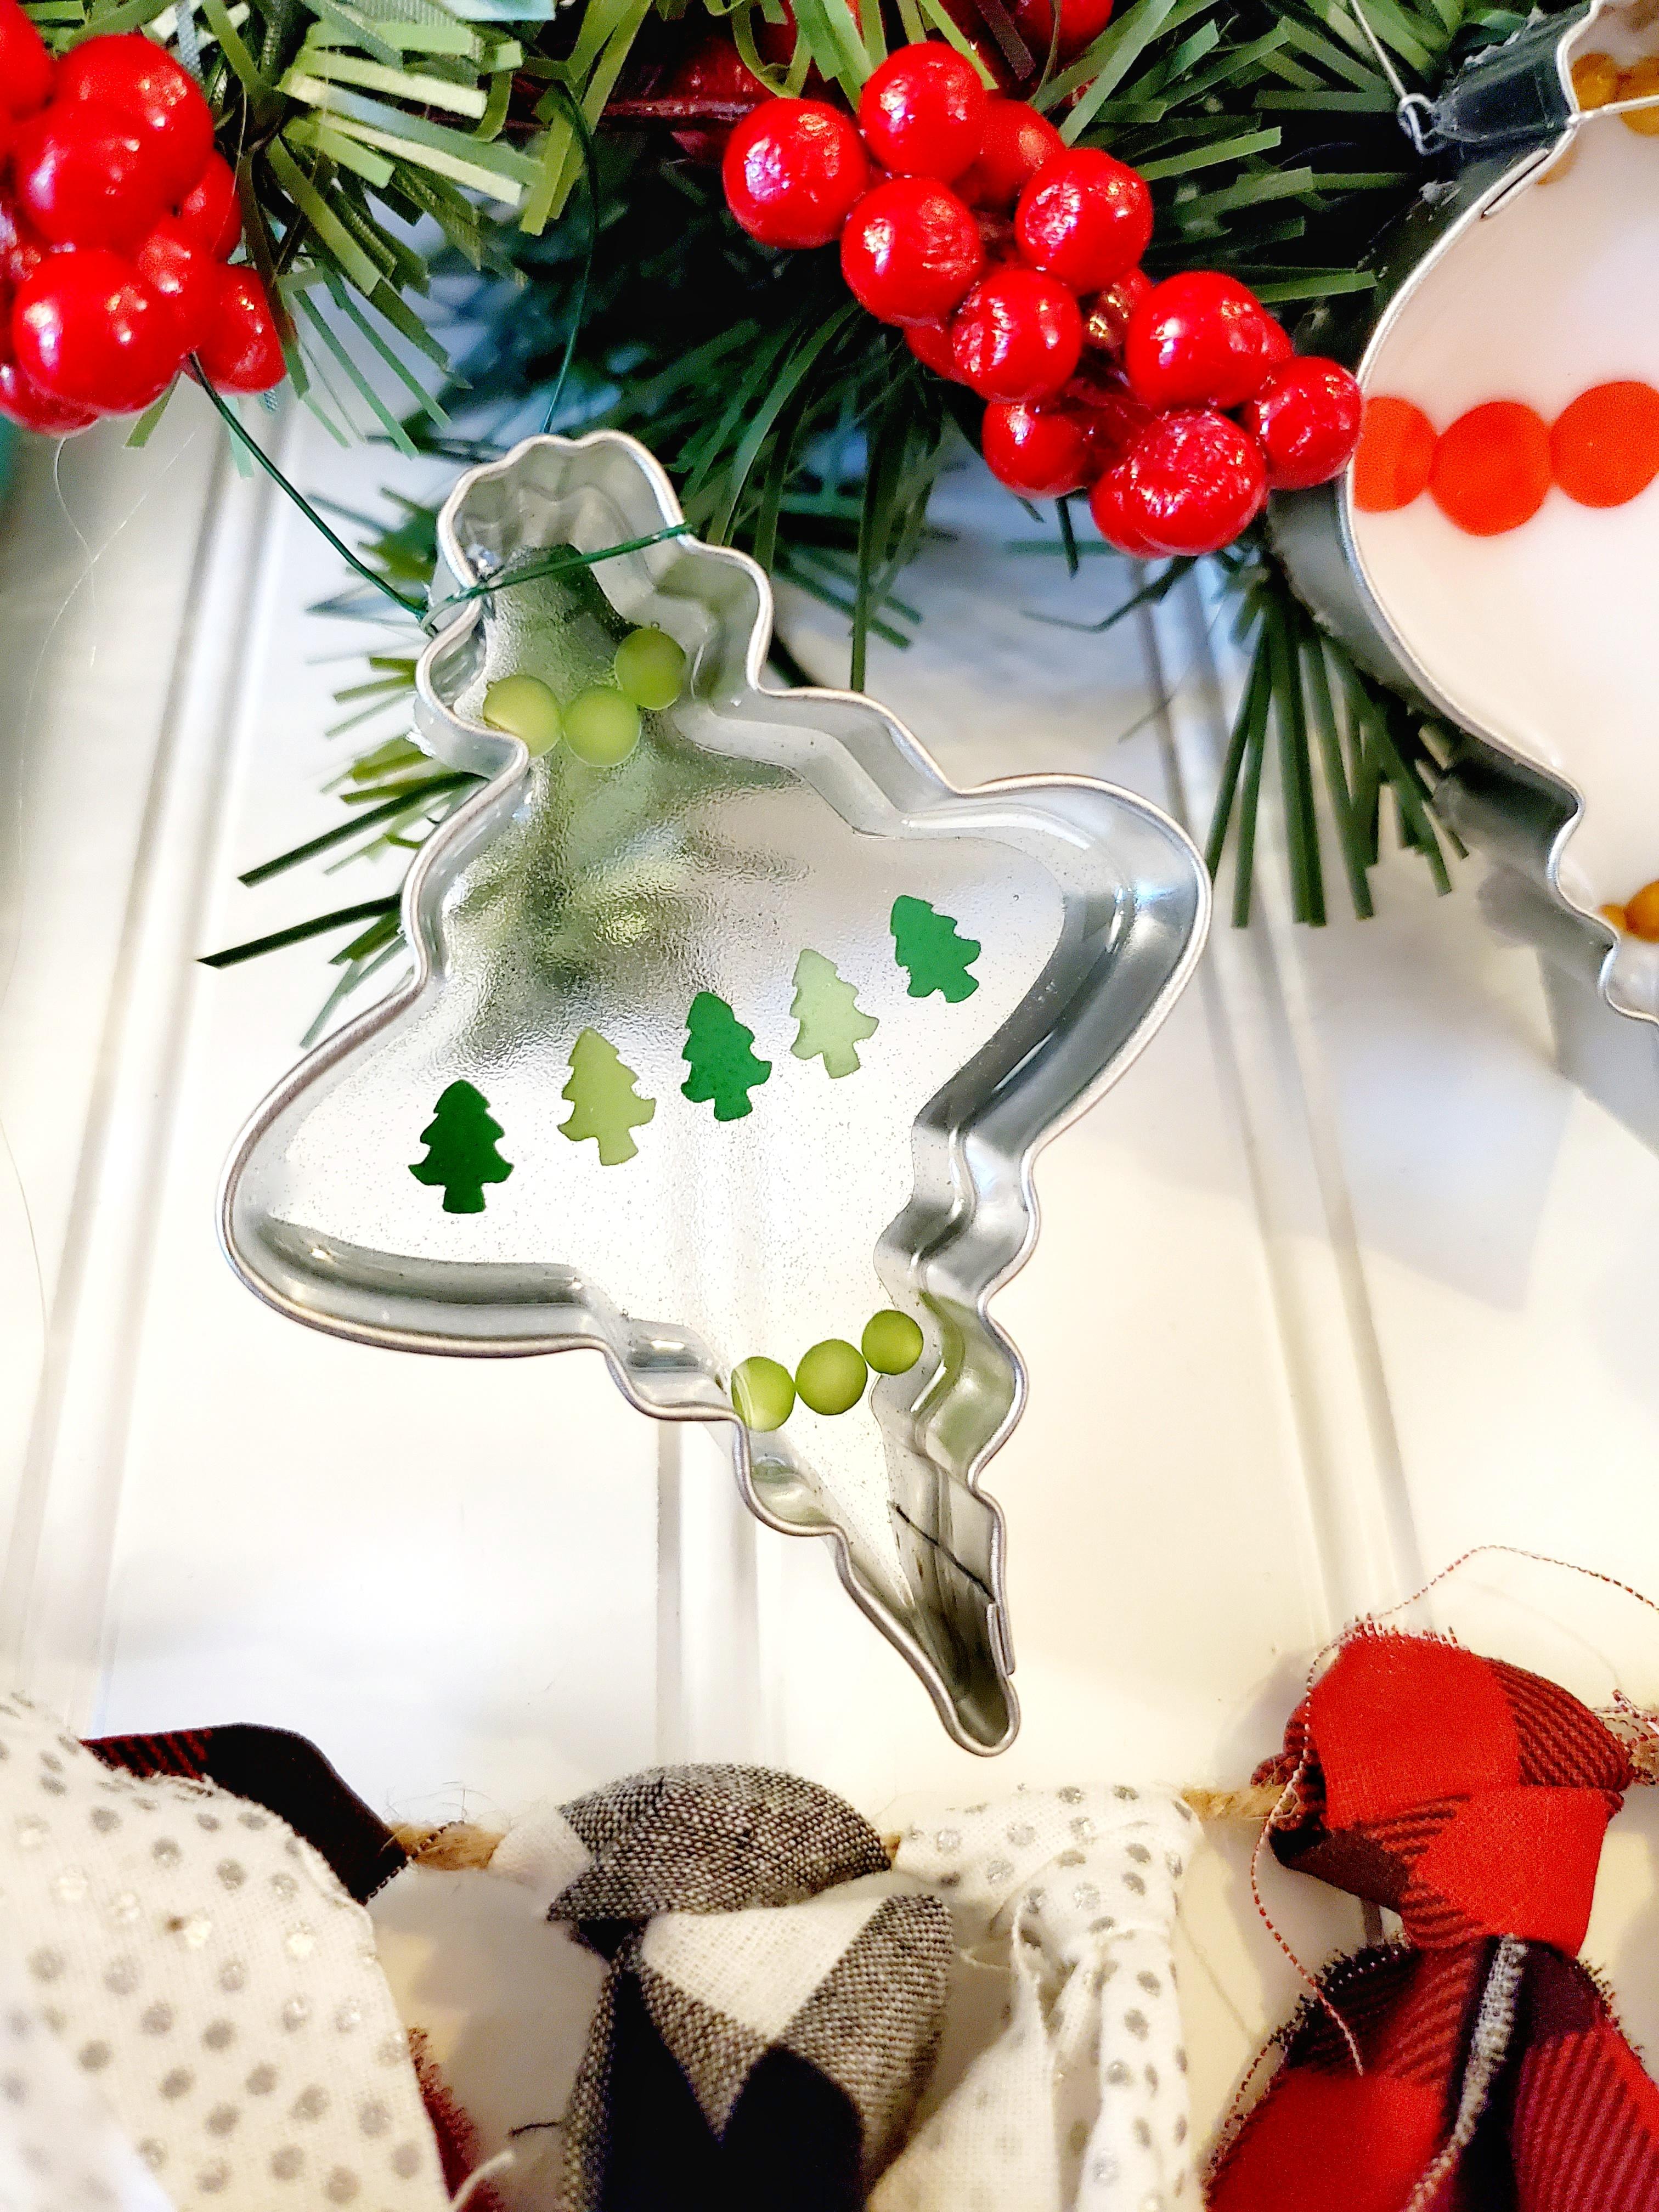 Resin Christmas ornament